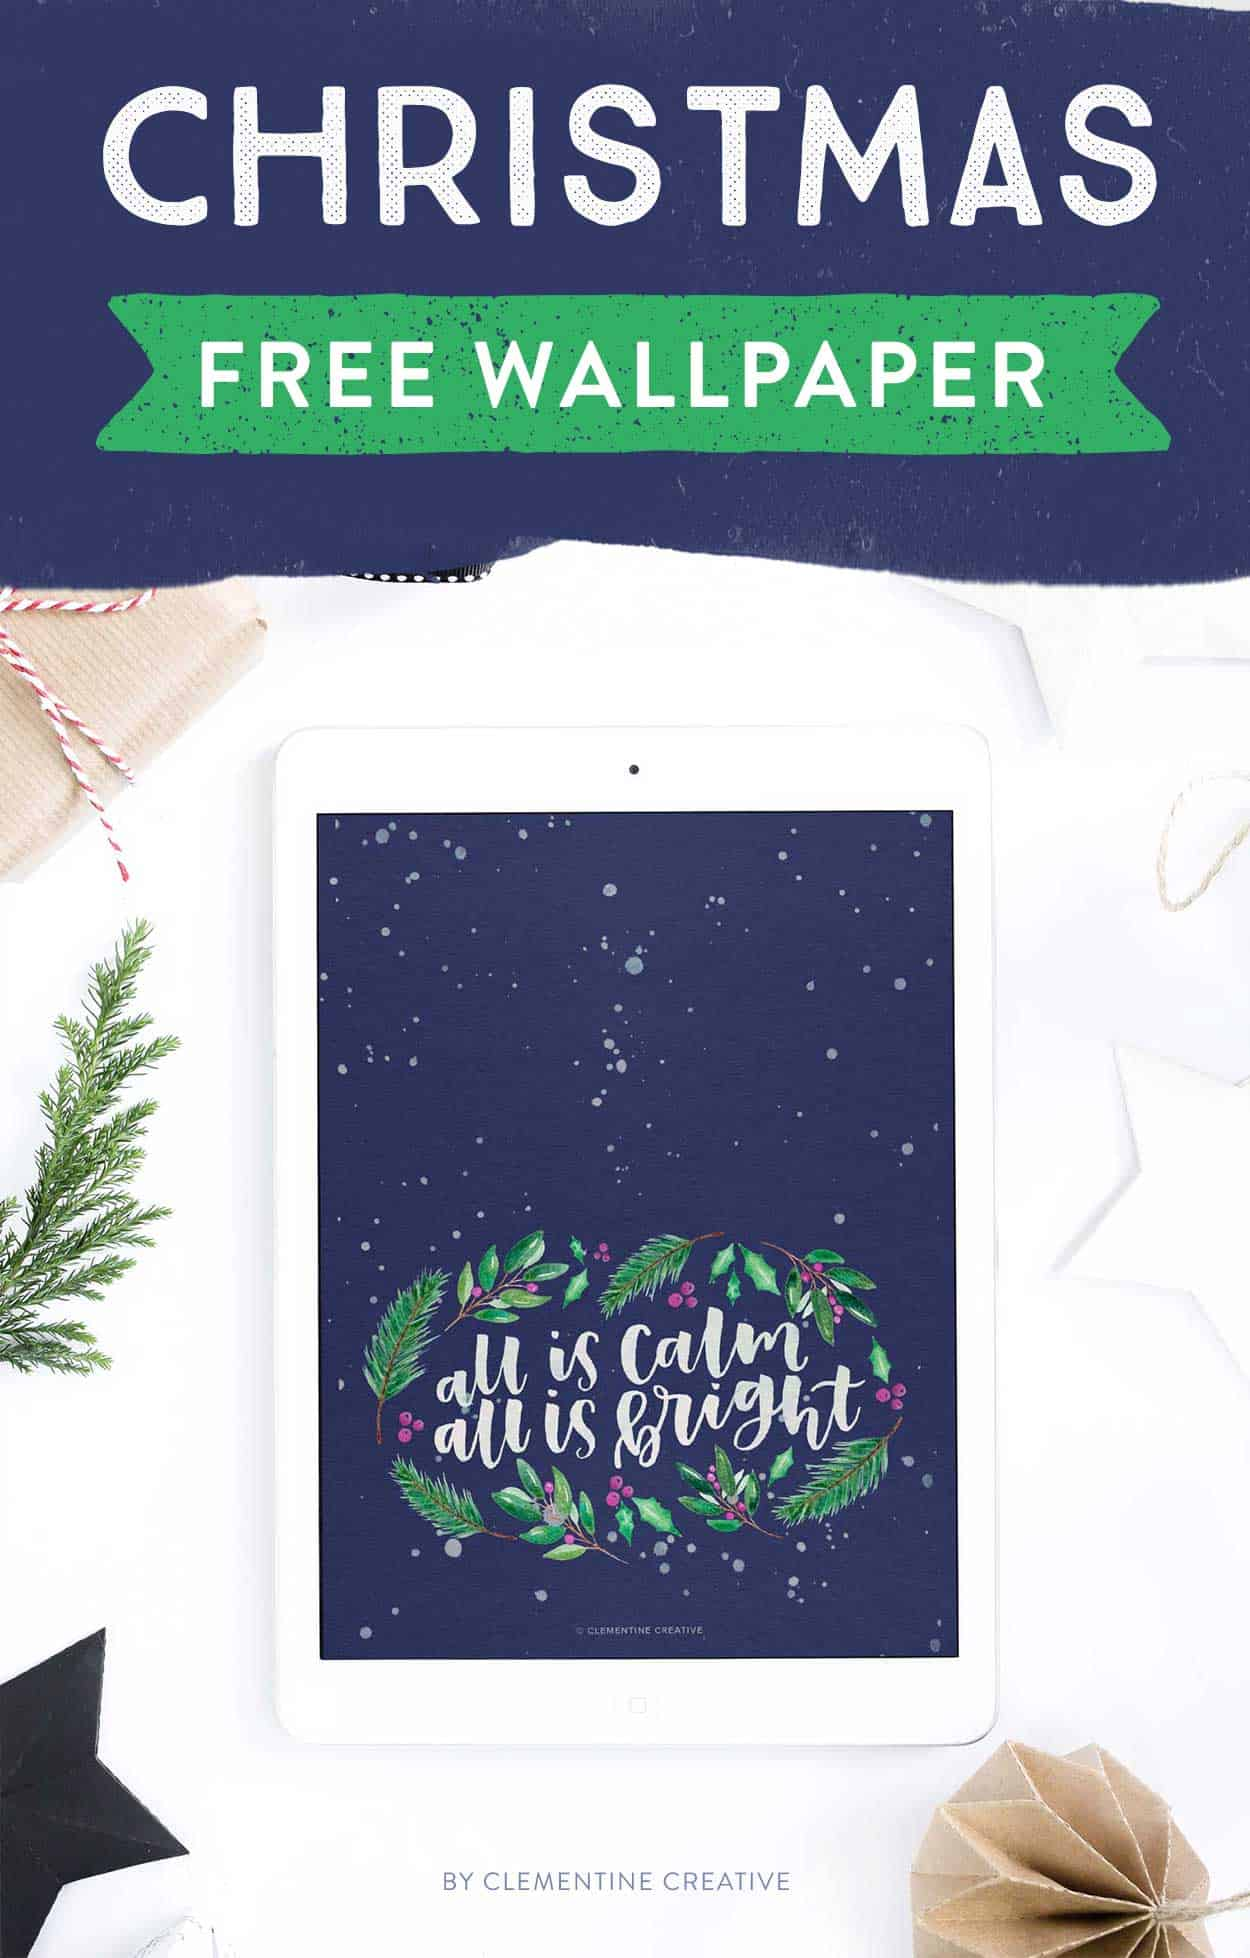 free Christmas wallpaper for ipad